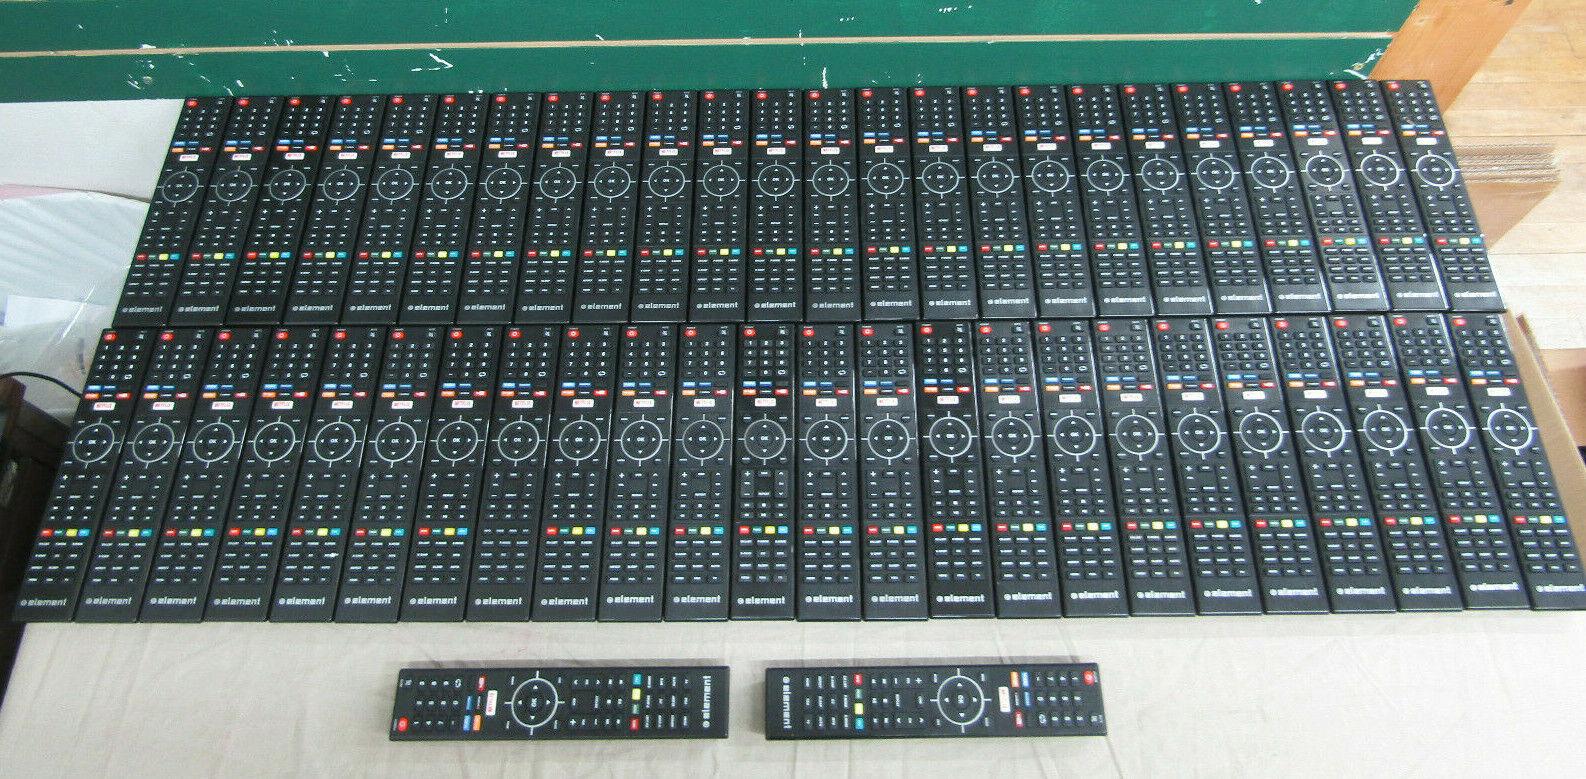 NEW LOT OF 50 GENUINE ELEMENT TV REMOTE CONTROLS 845-058-03B